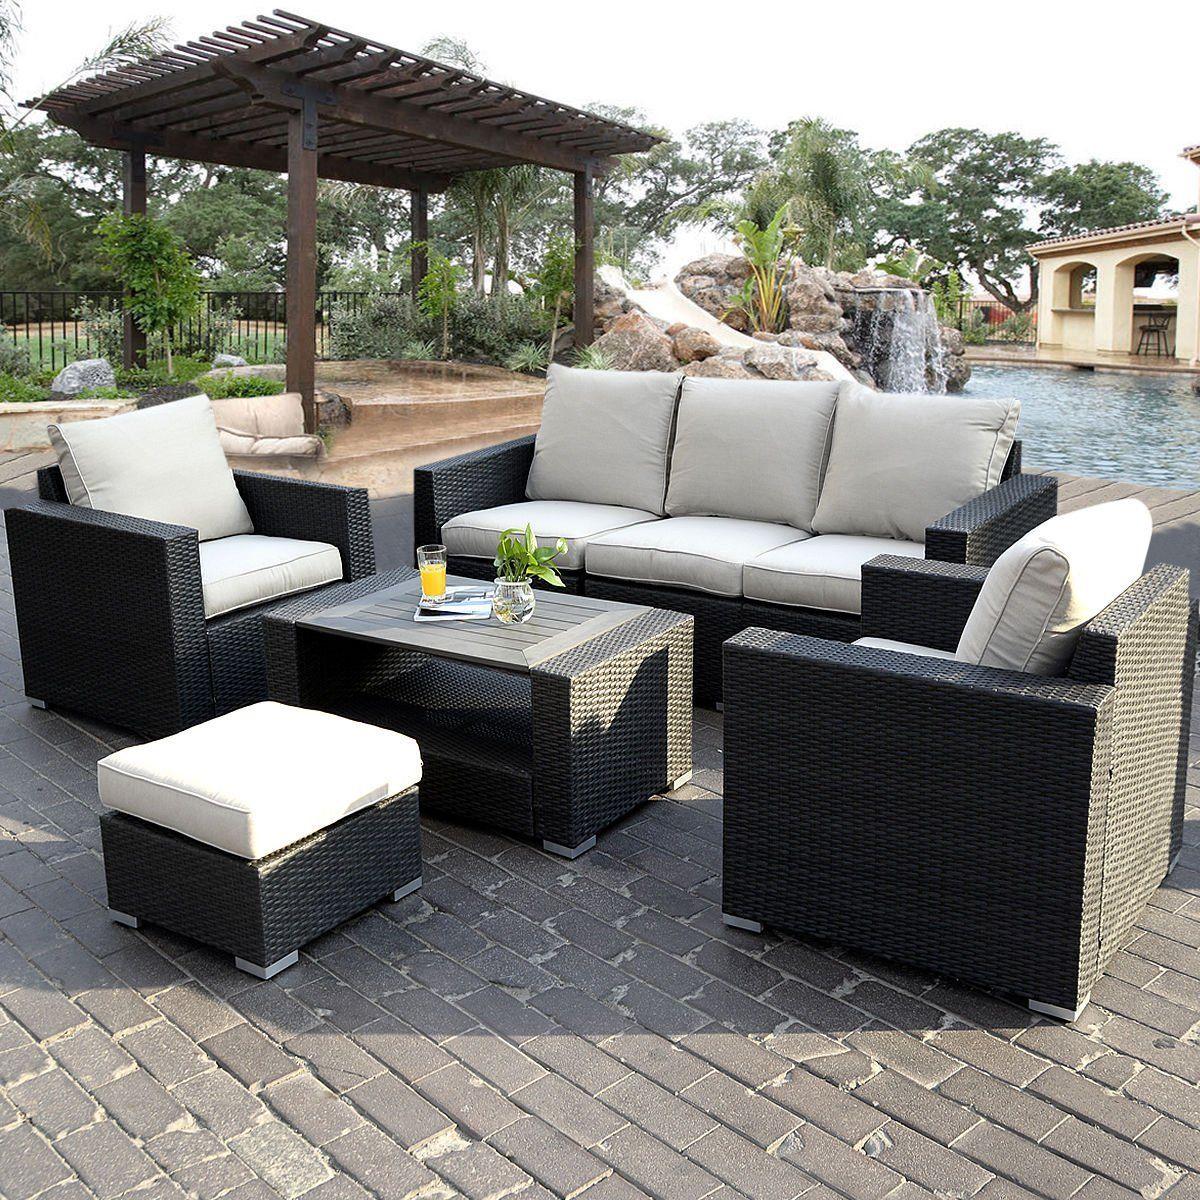 Pleasant Amazon Com Giantex 7Pc Outdoor Patio Patio Sectional Ibusinesslaw Wood Chair Design Ideas Ibusinesslaworg